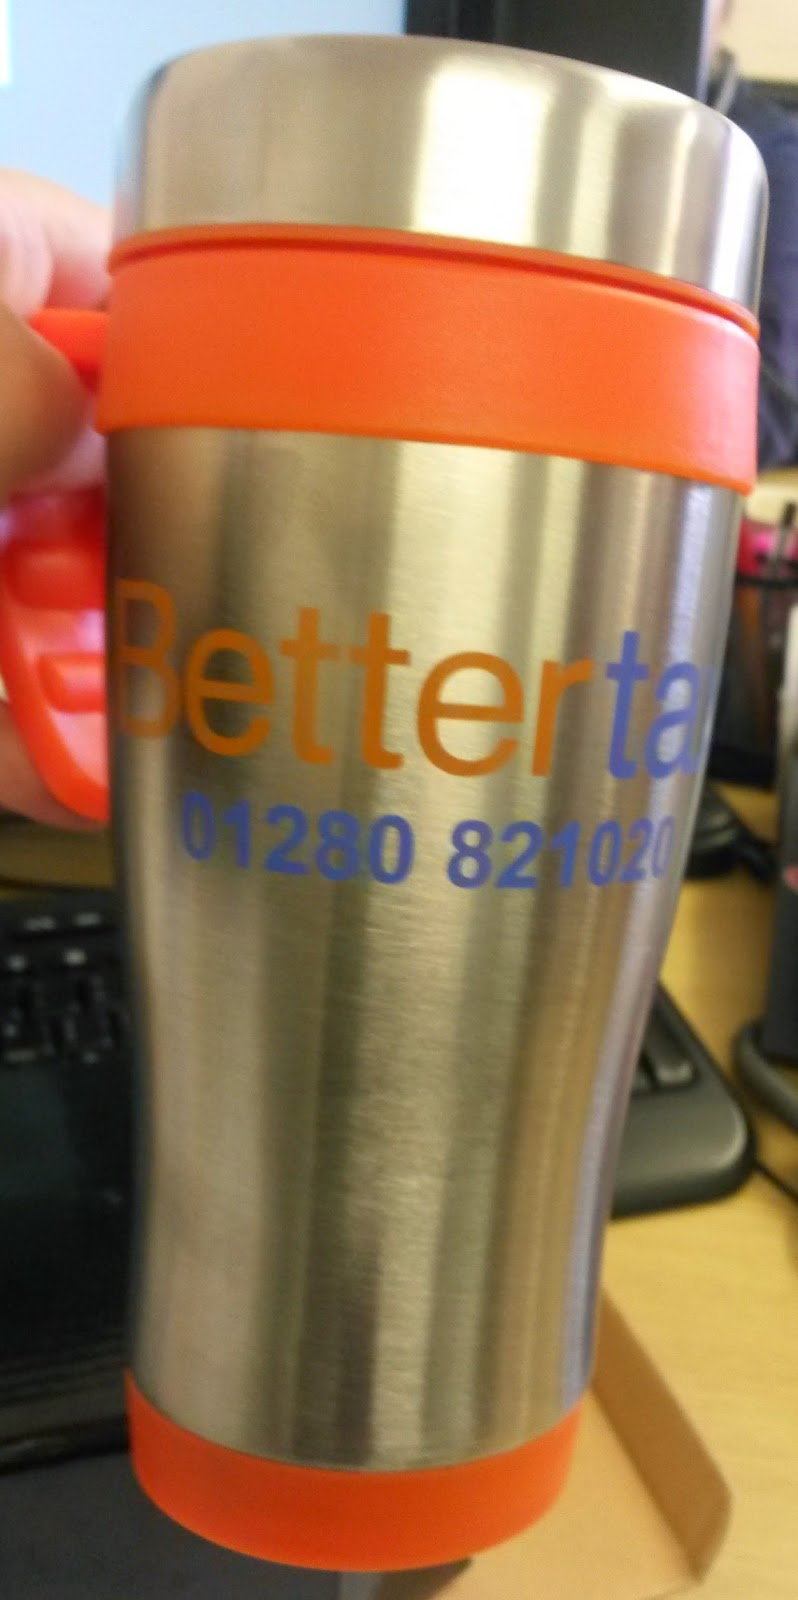 Bettertax tradesman mug